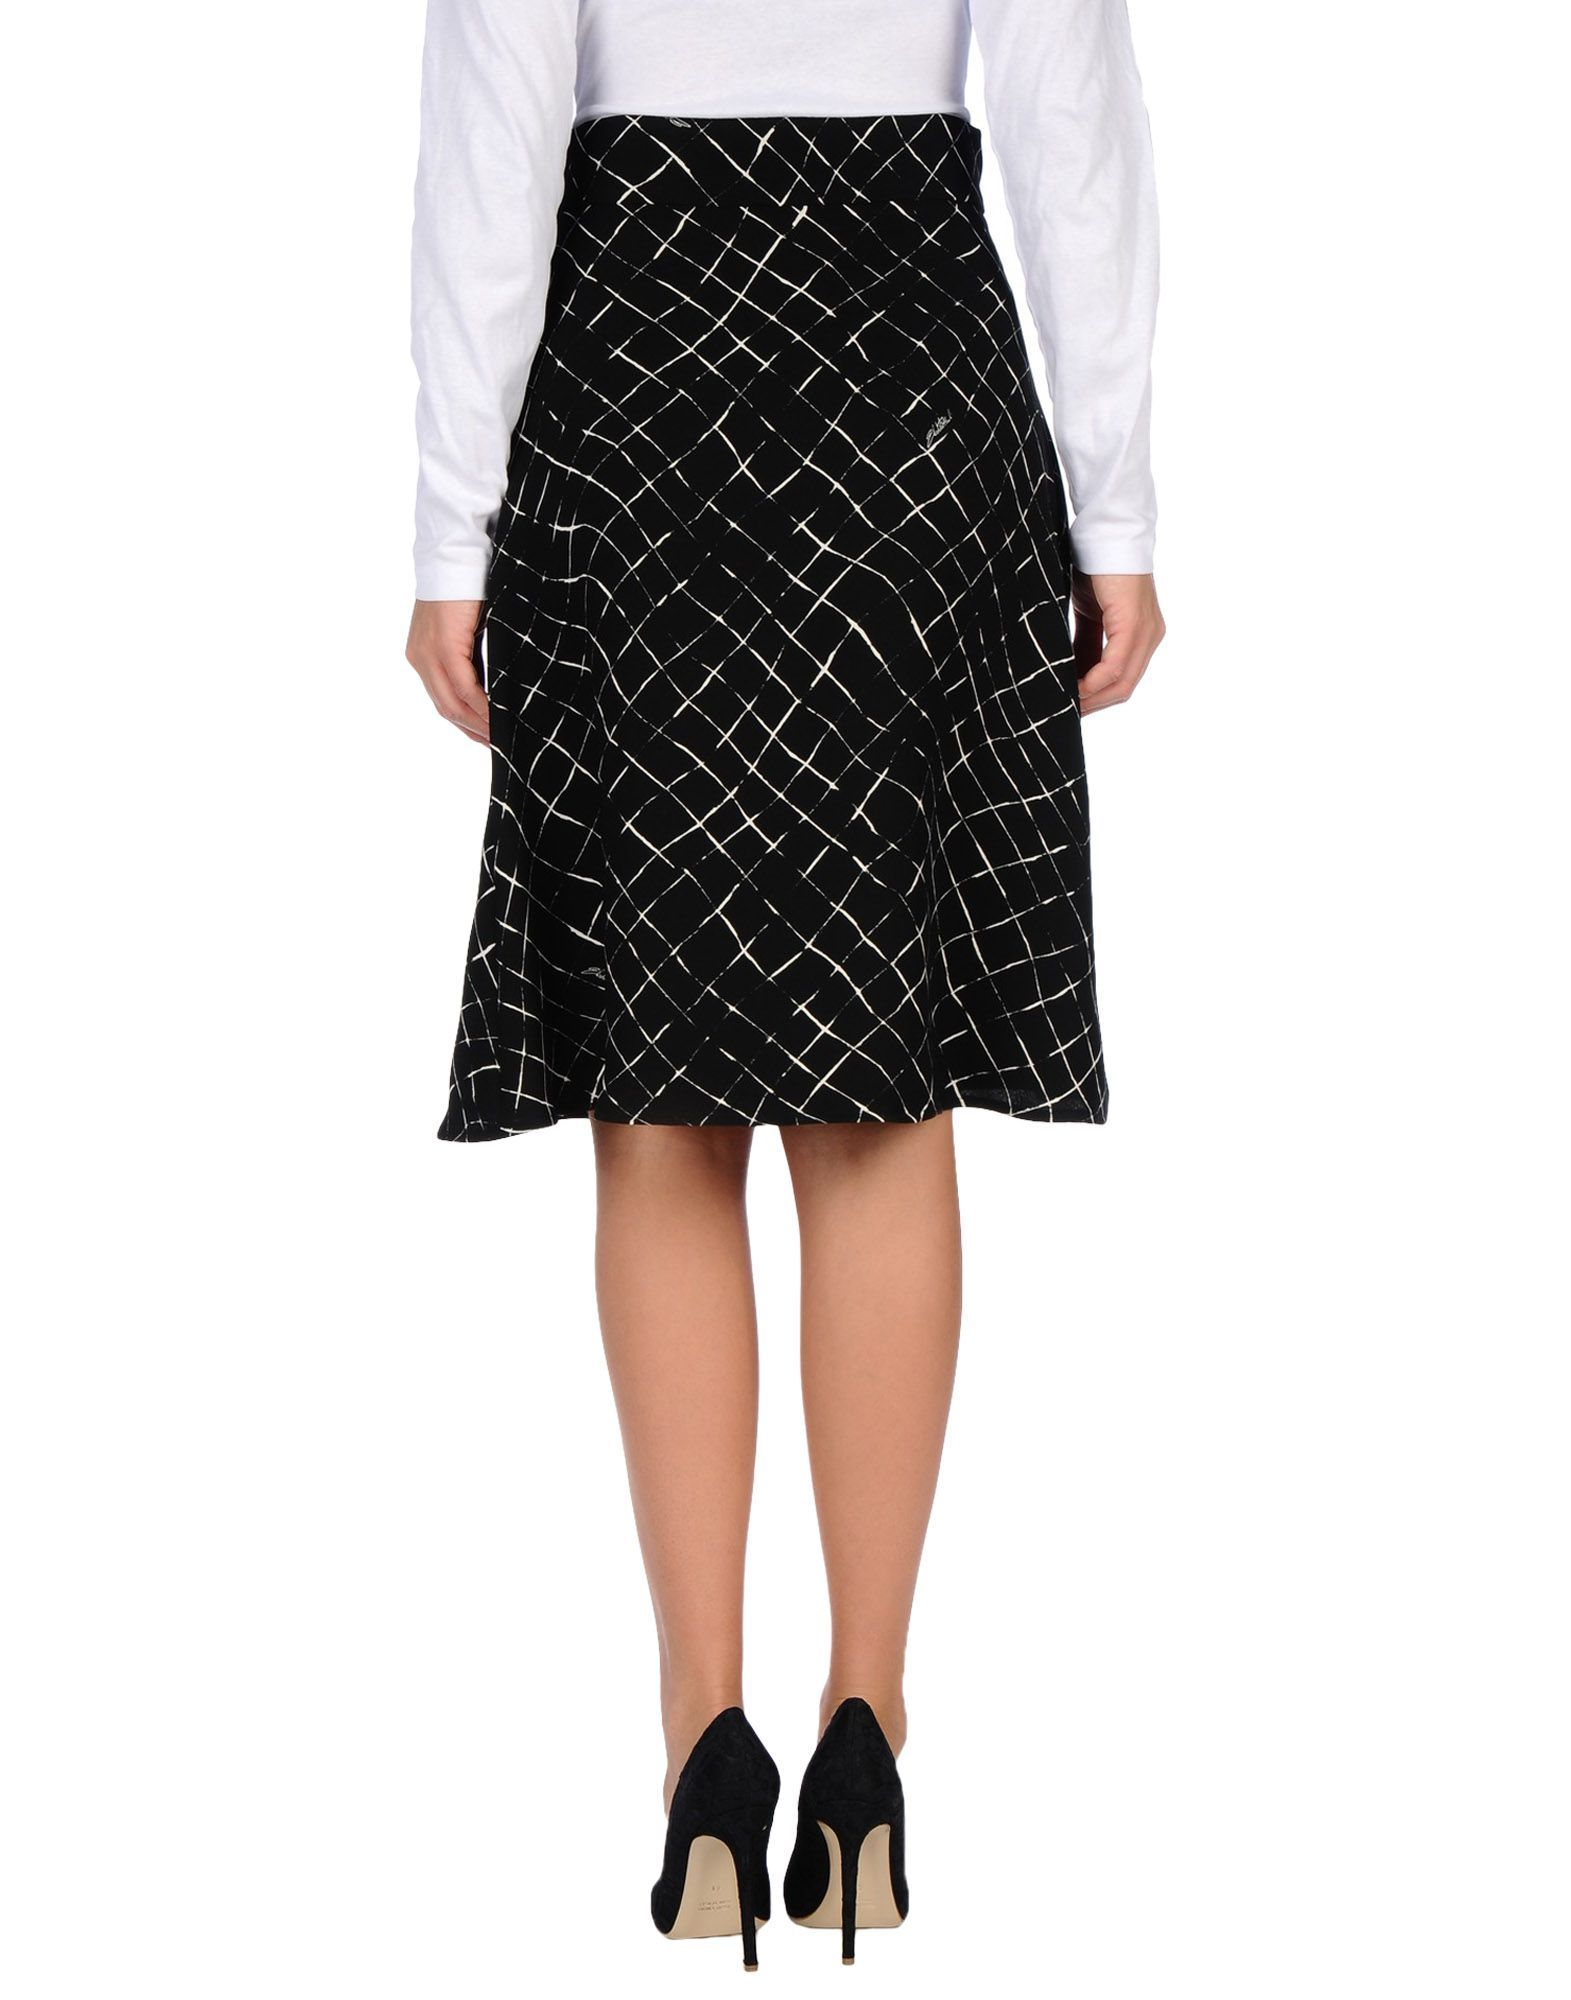 Elisabetta Franchi Black A-Line Knee Length Skirt